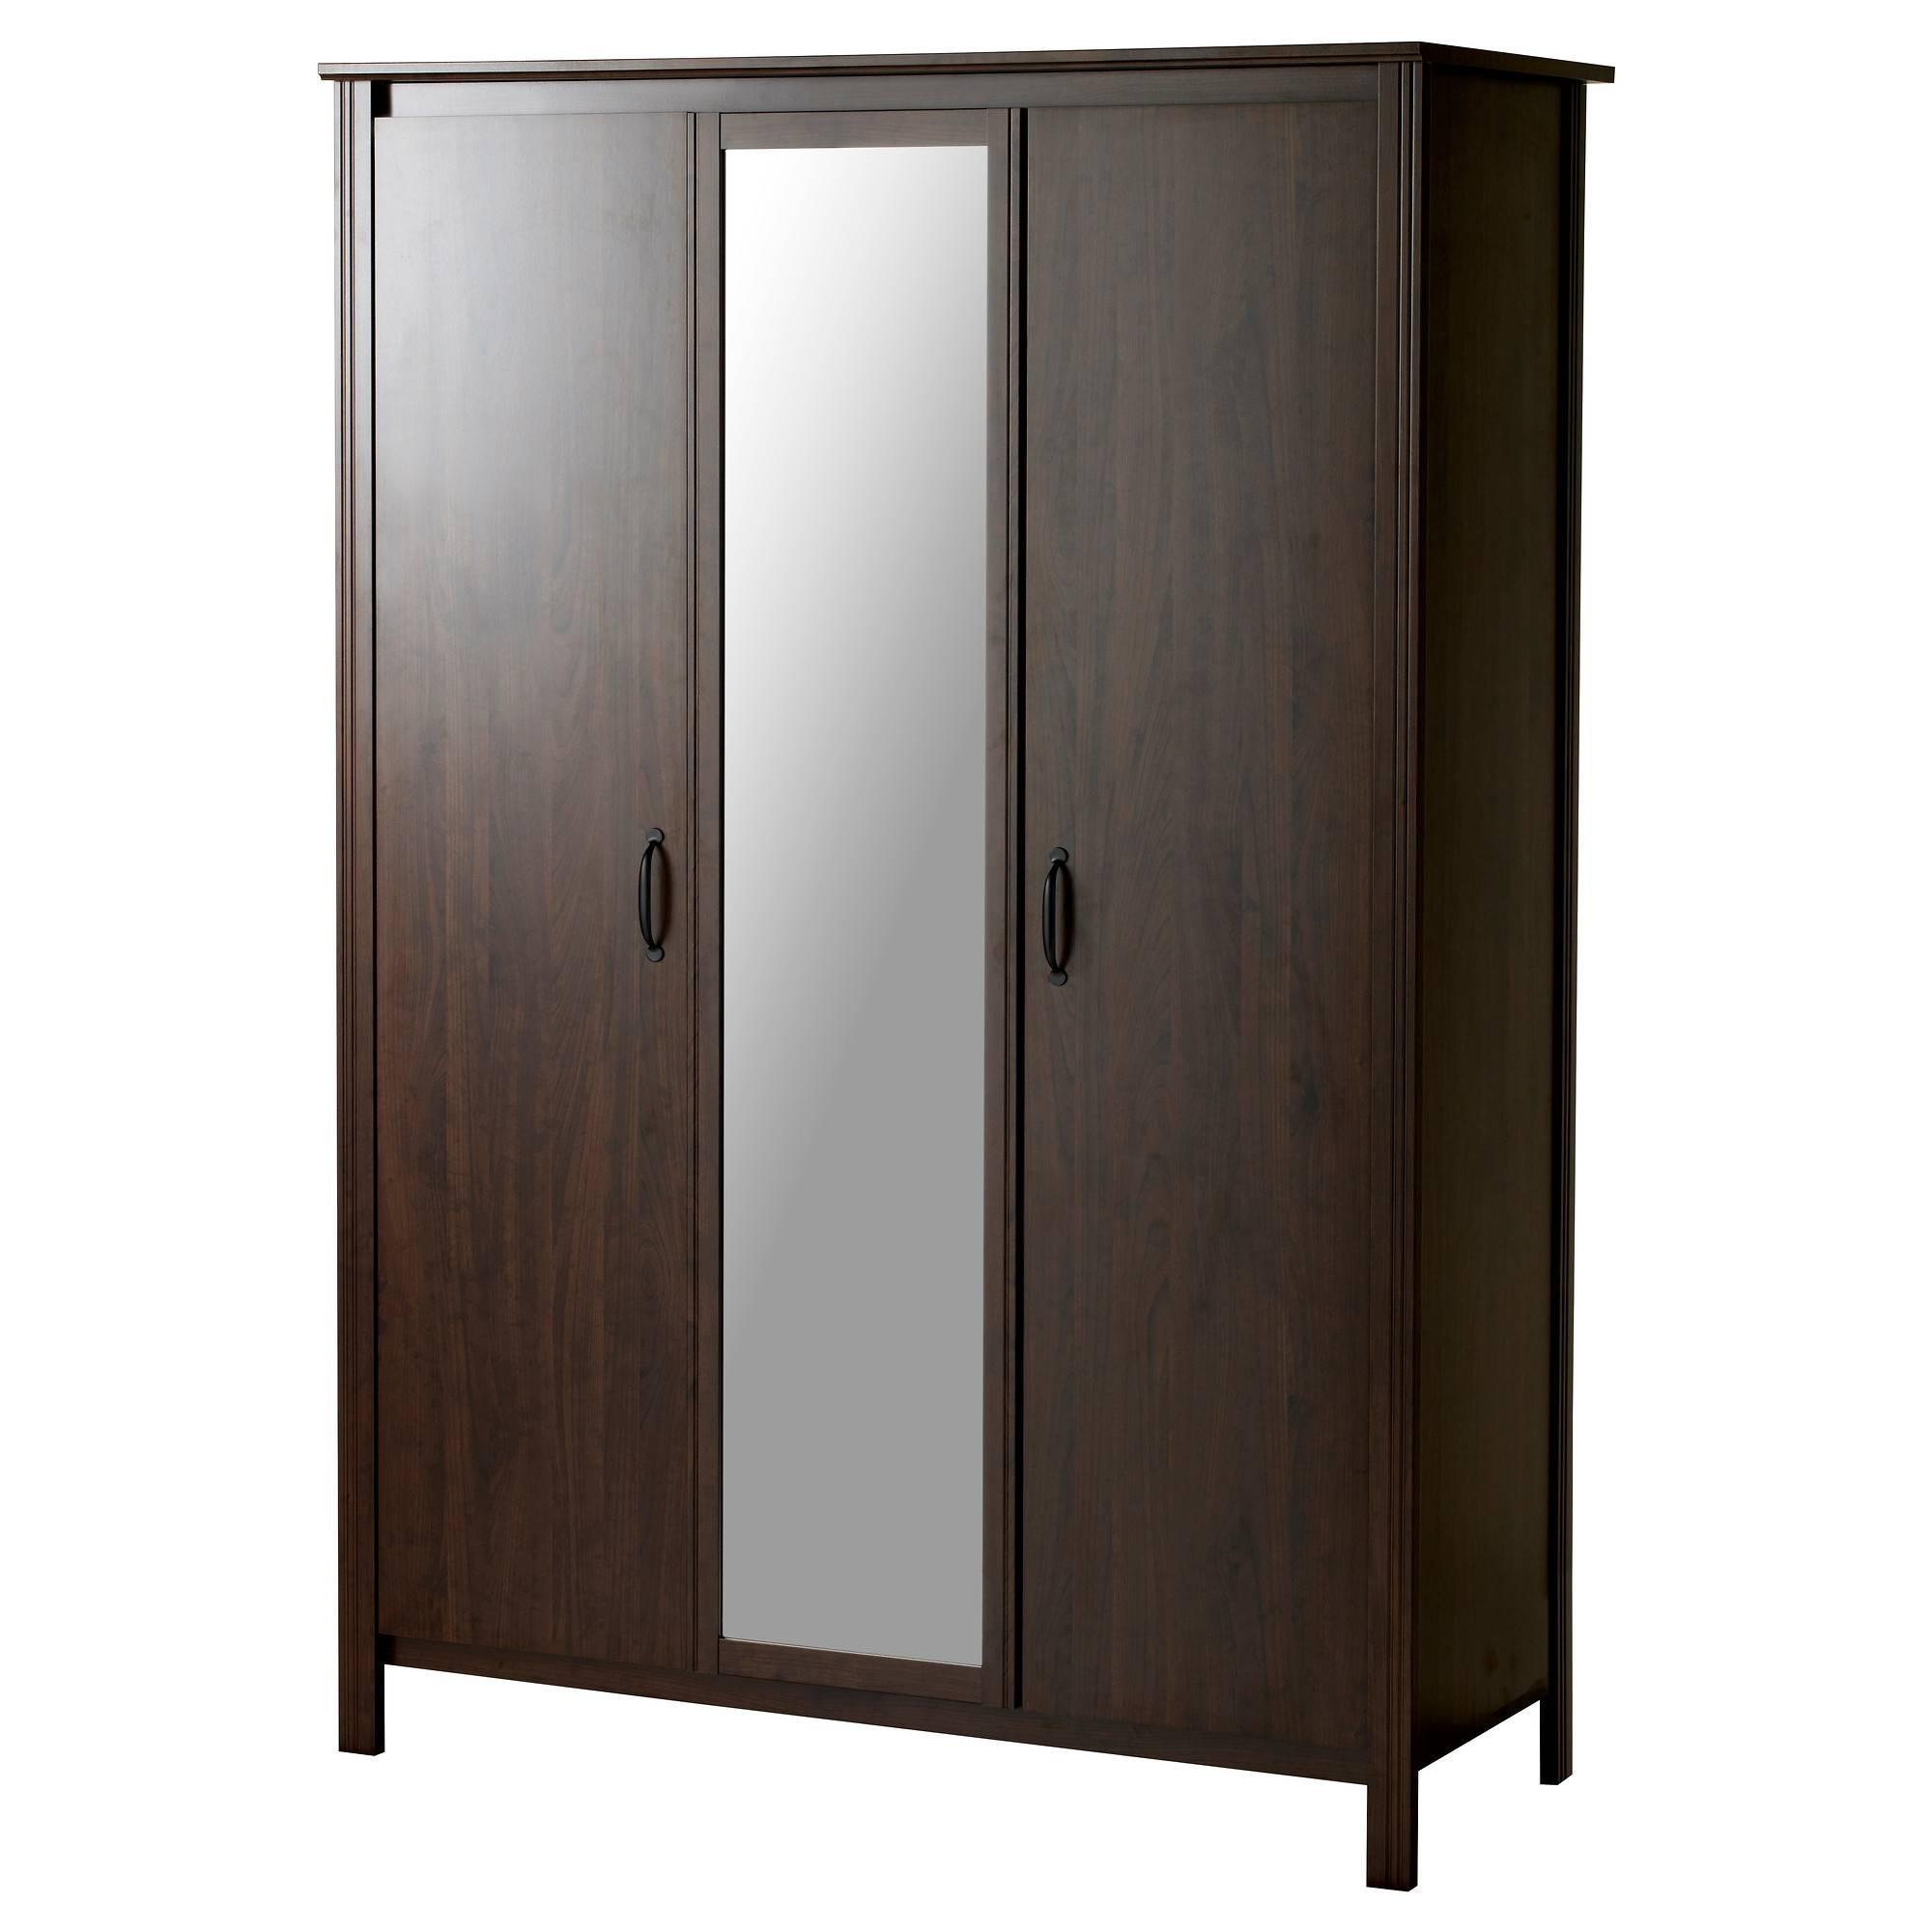 Brusali Wardrobe With 3 Doors - White - Ikea regarding Three Door Mirrored Wardrobes (Image 6 of 15)